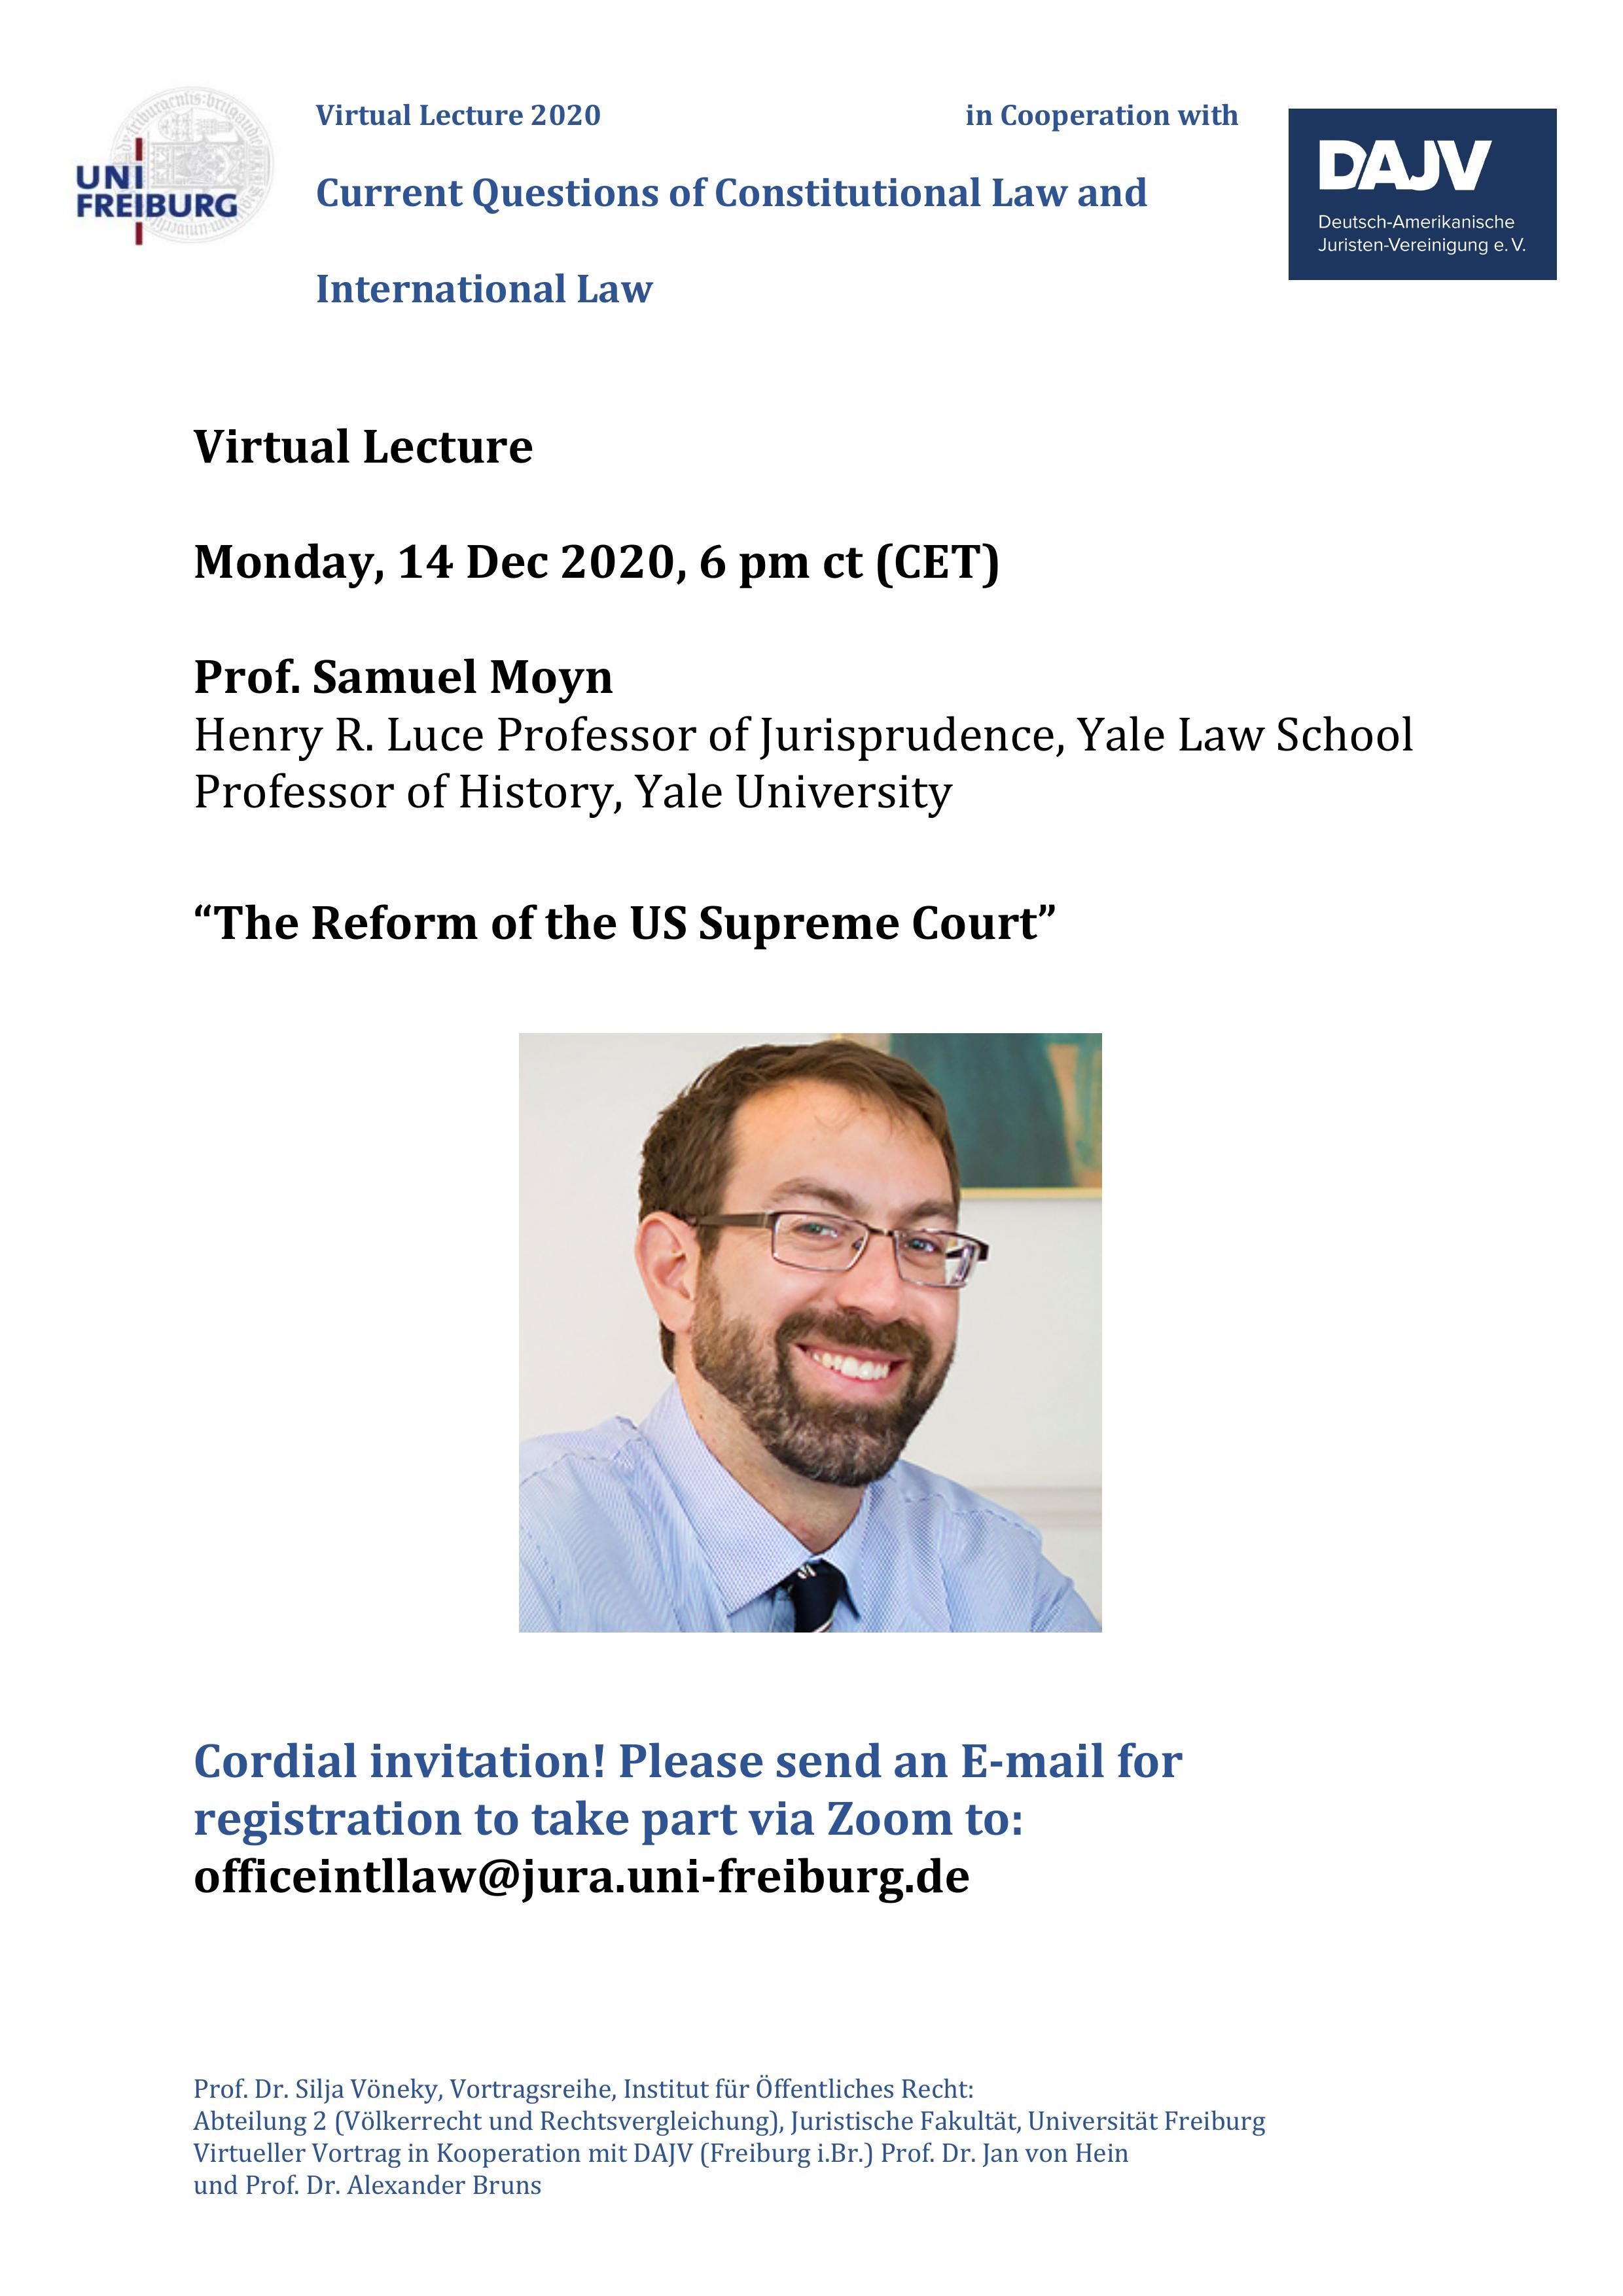 Samuel Moyn Lecture